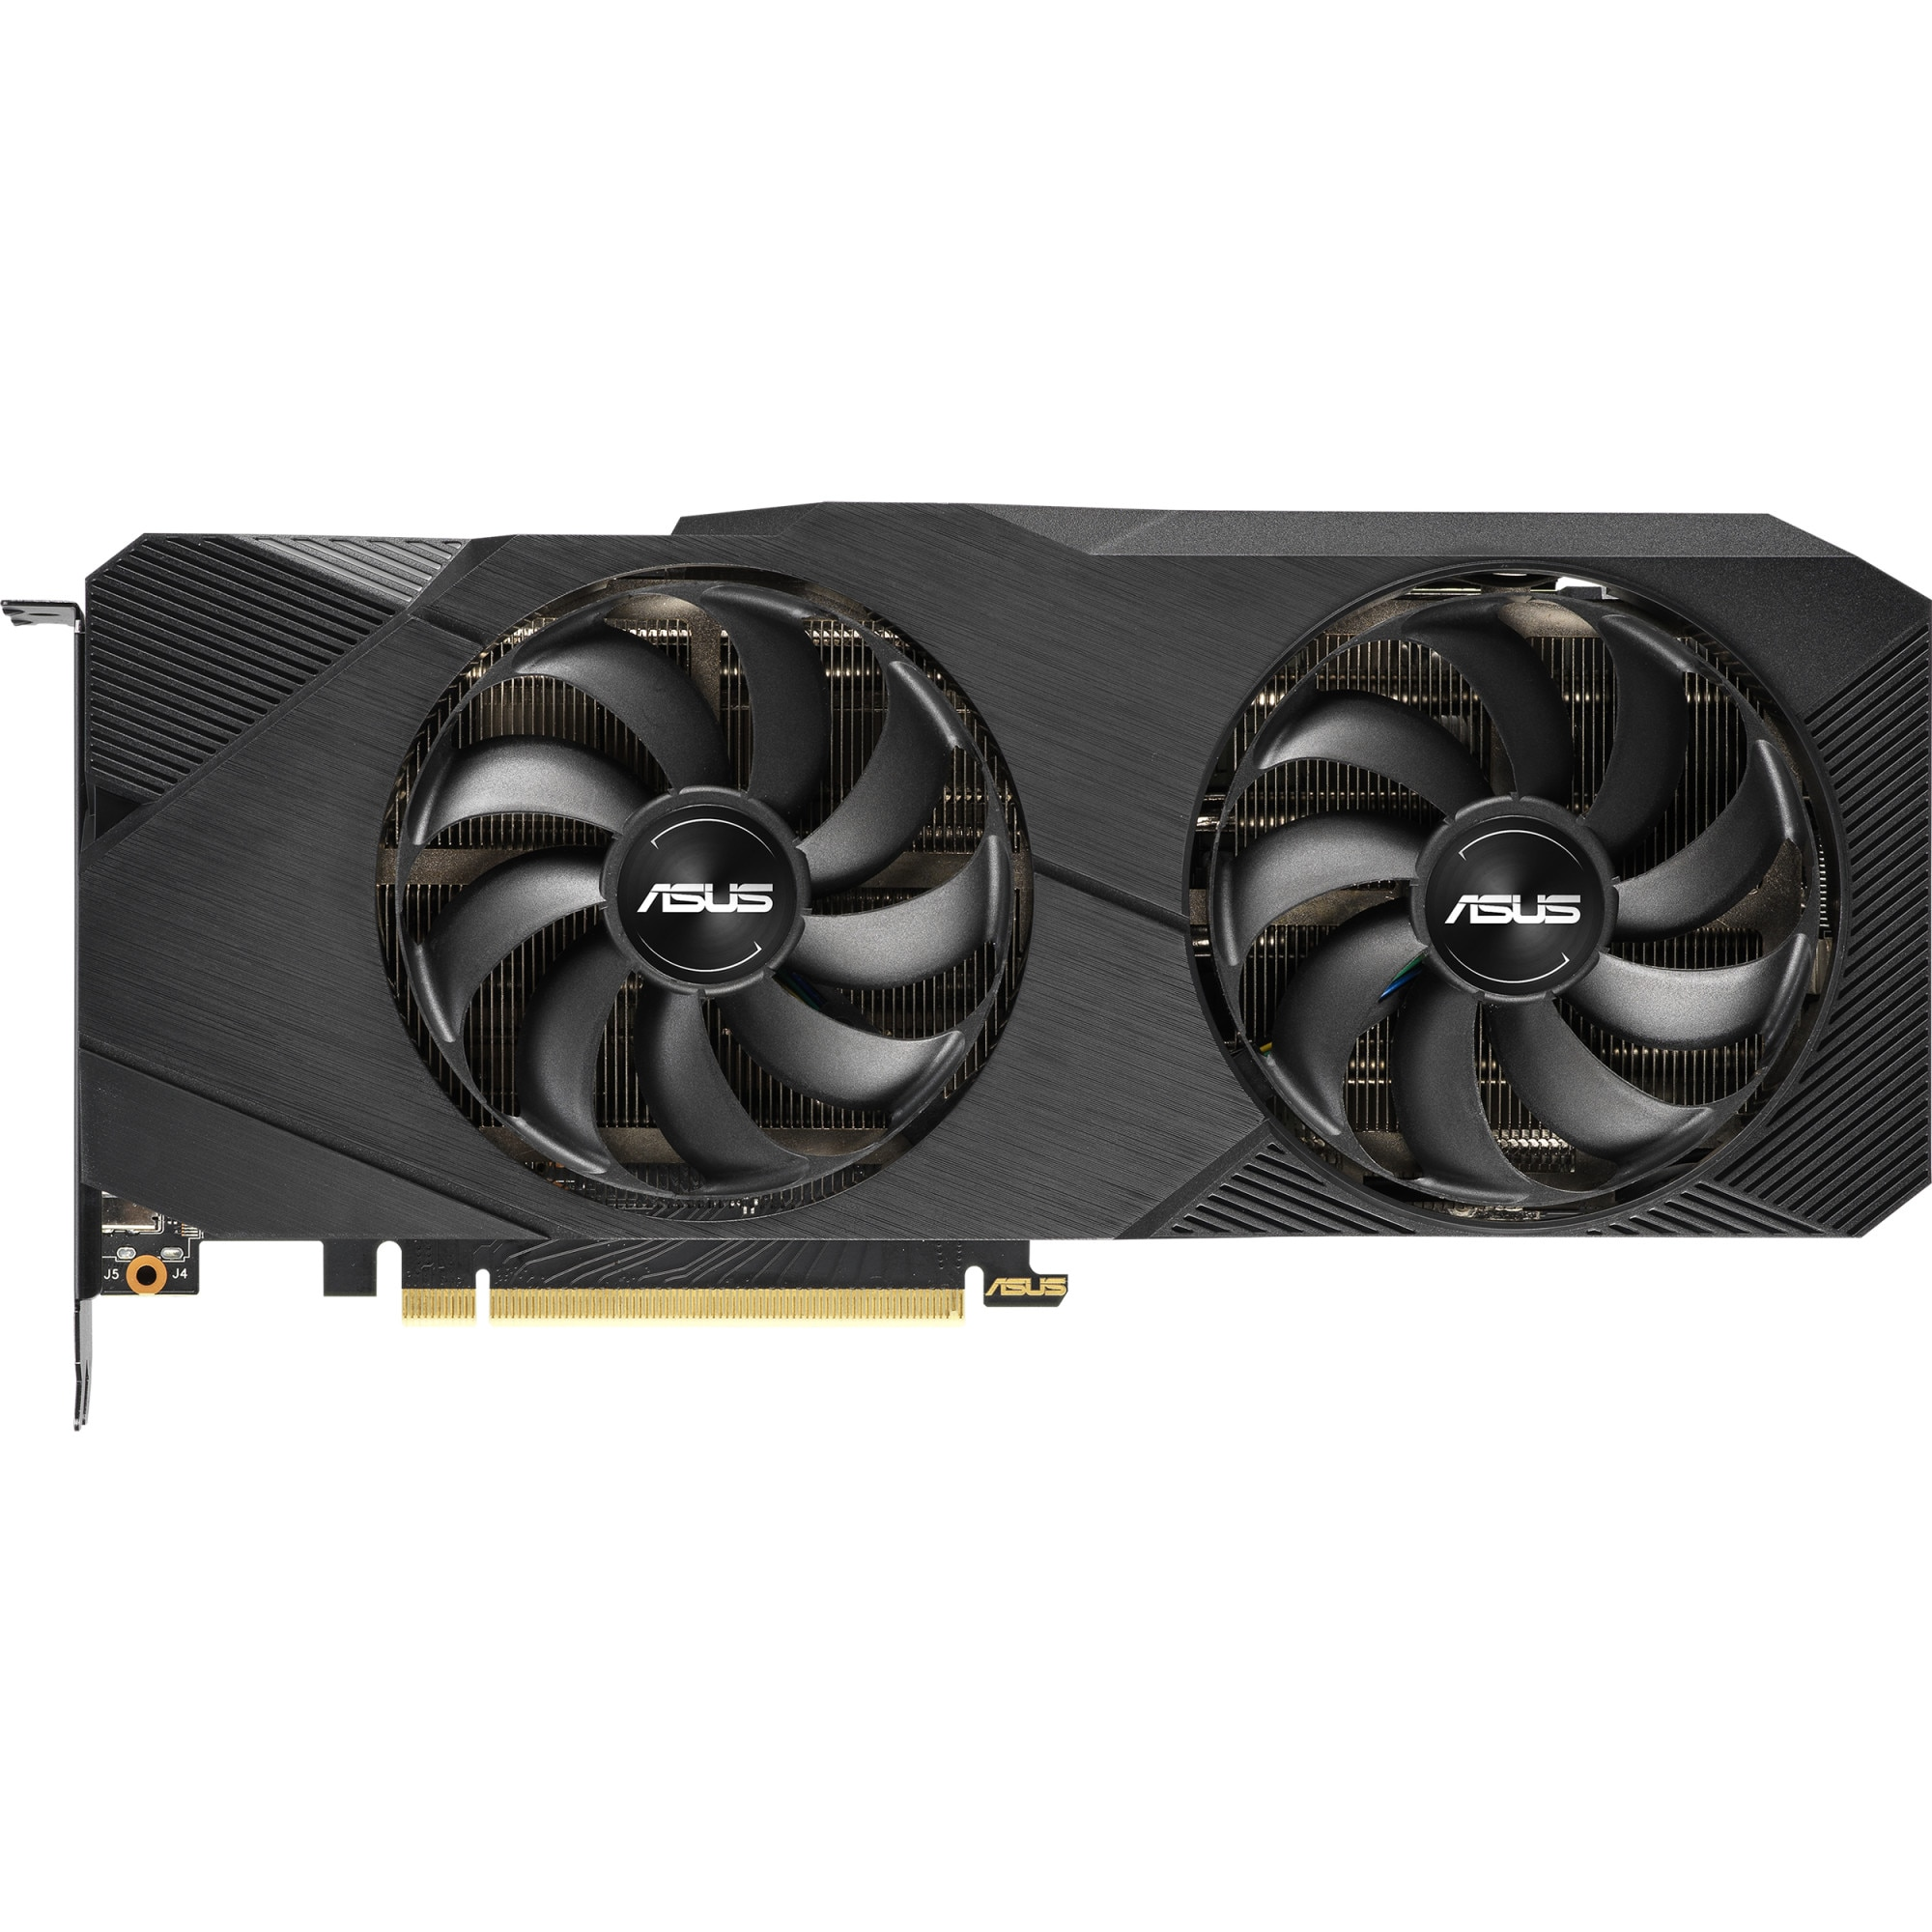 Fotografie Placa video ASUS GeForce RTX 2080 SUPER EVO V2, 8GB GDDR6, 256-bit